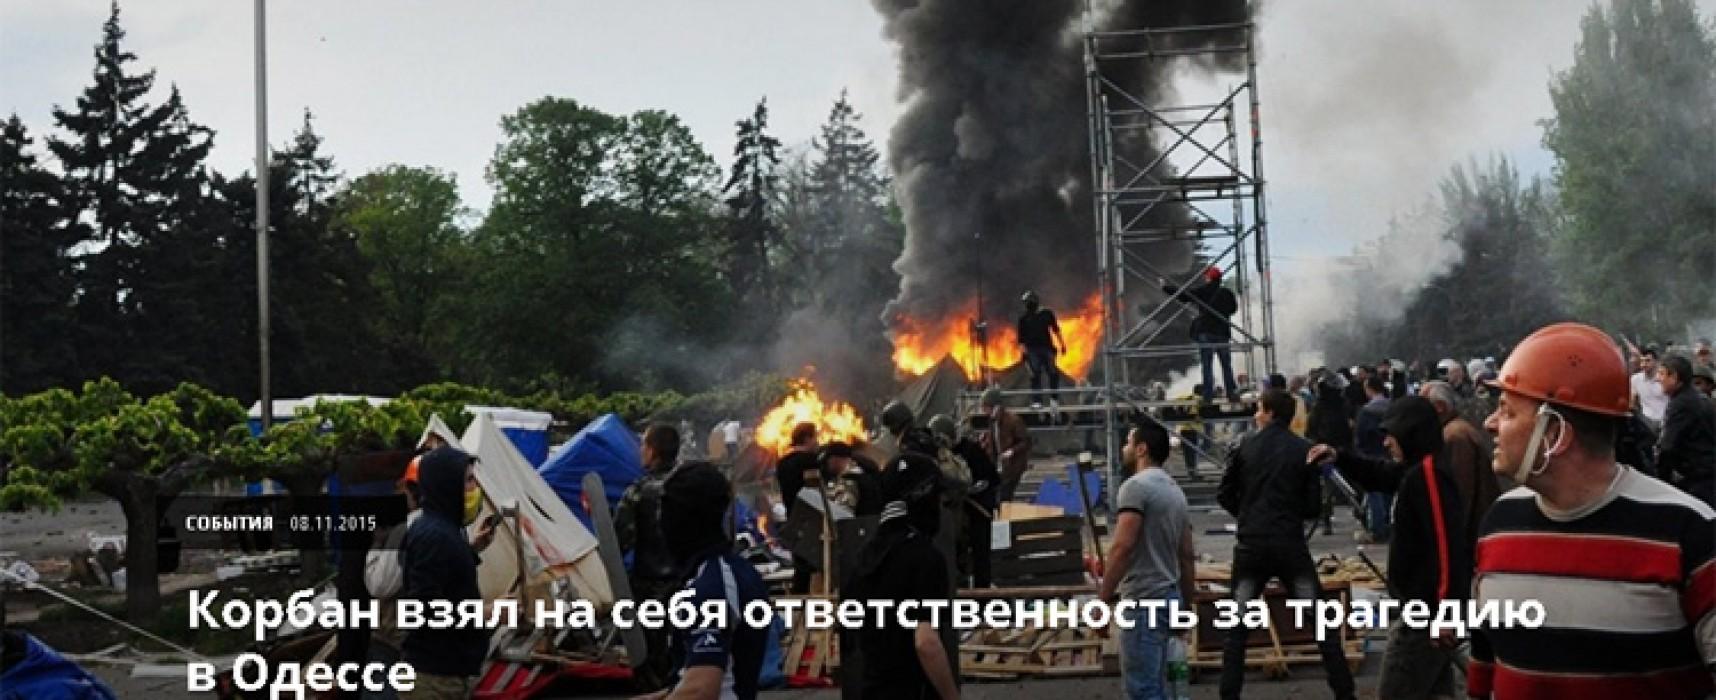 Fake: Korban Admits Guilt in Odesa Fire